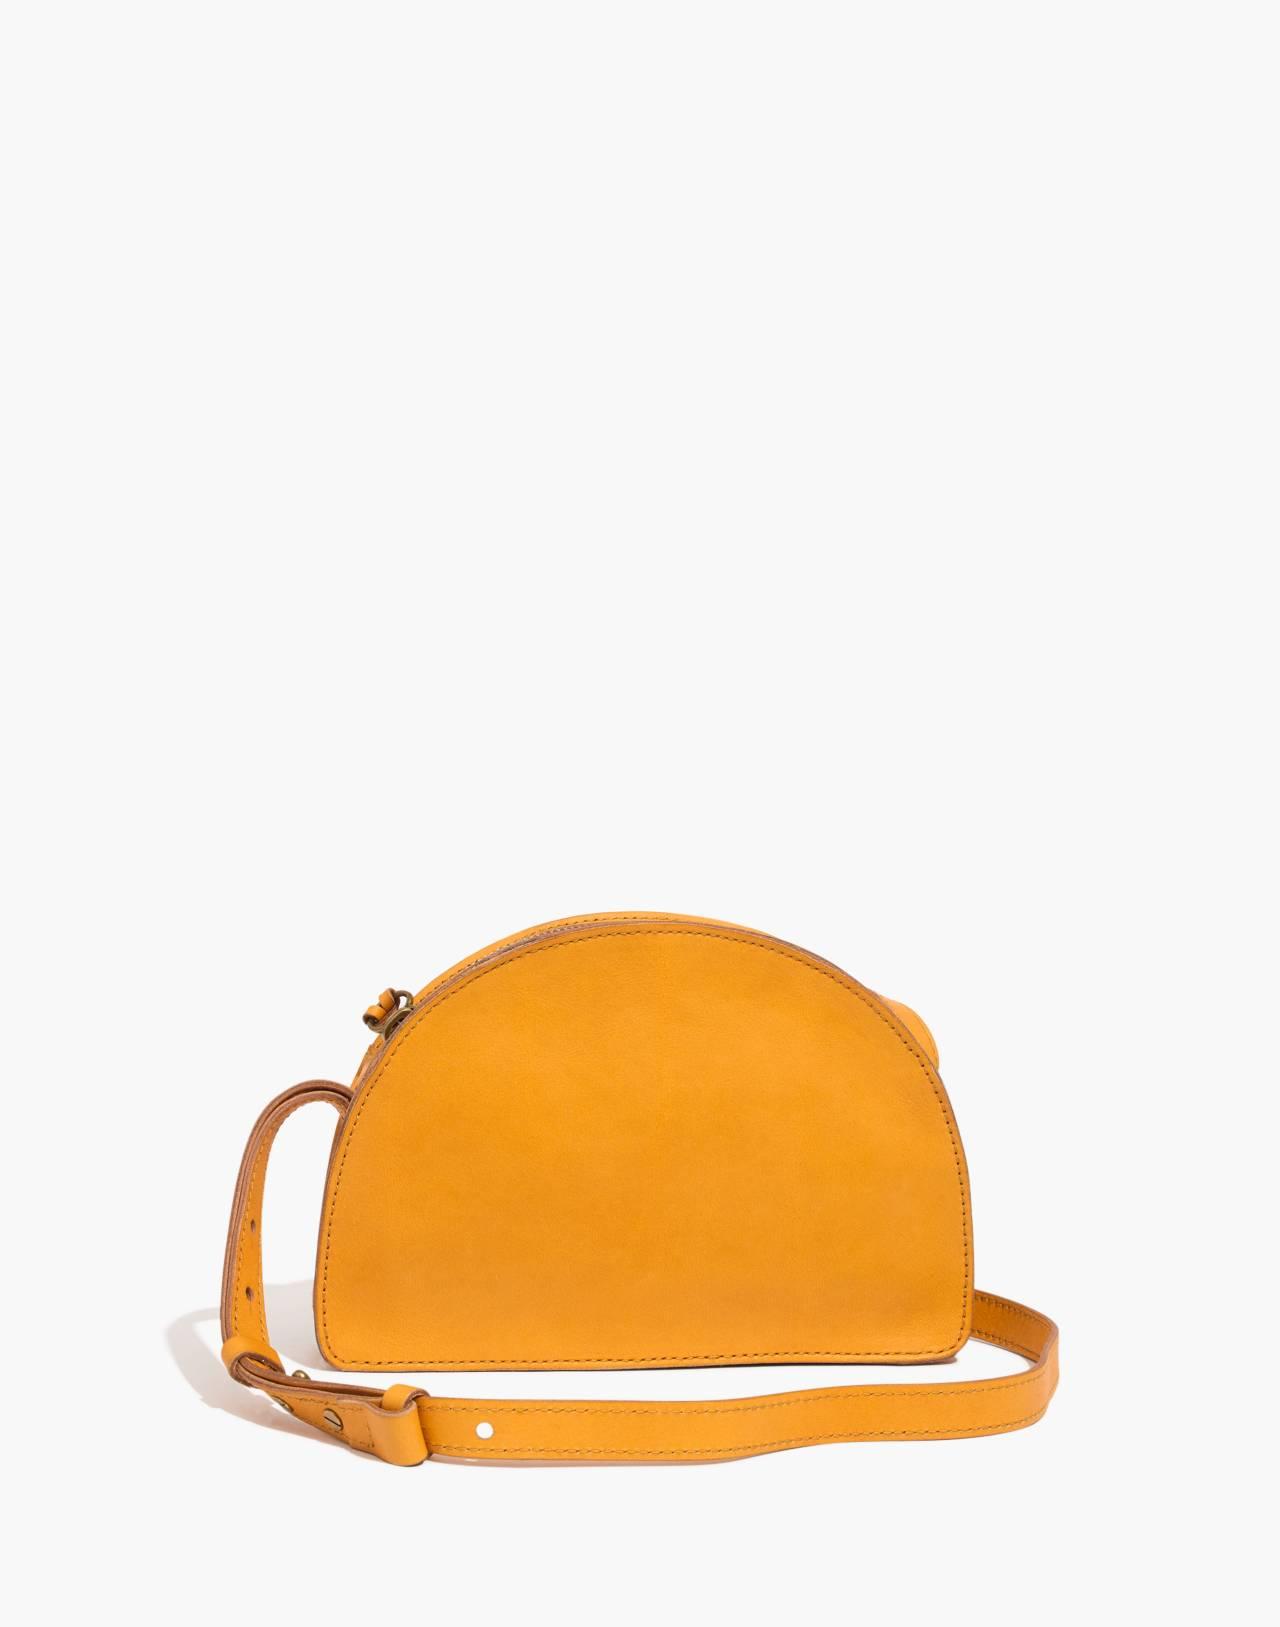 The Simple Half-Moon Crossbody Bag in raw amber image 1